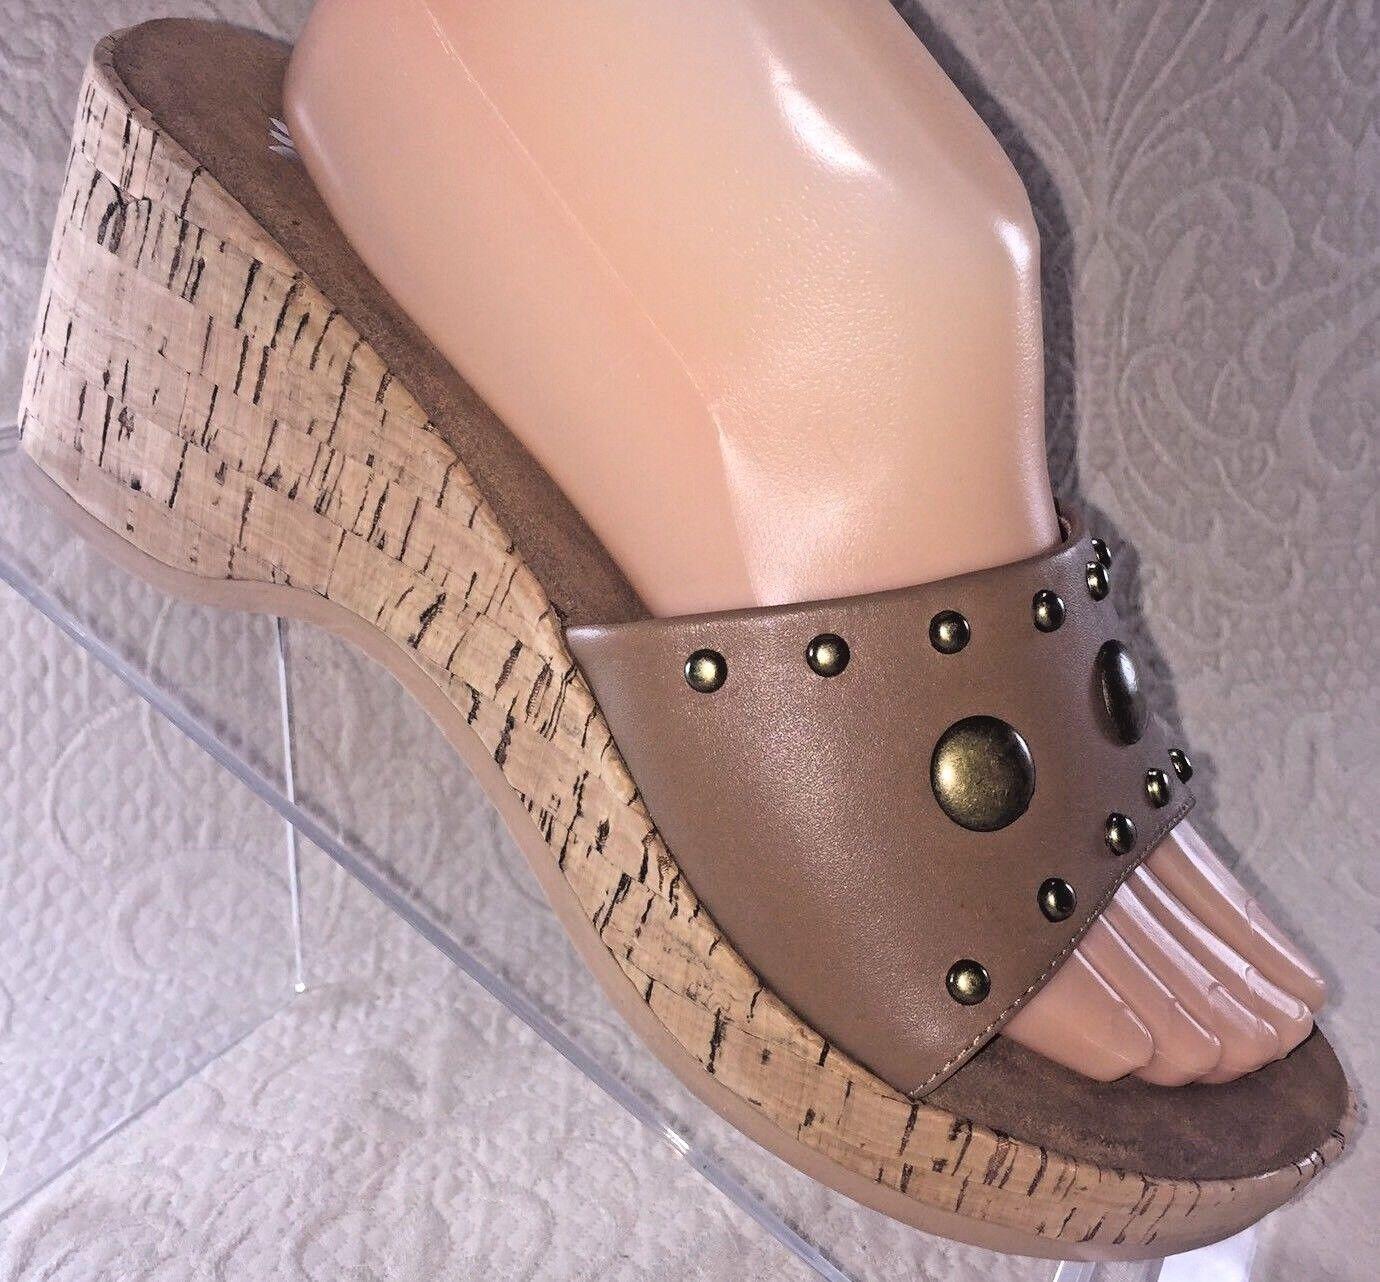 YELLOW BOX Women 8.5 BAYSIDE Leather Wedge Sandal Tan Brown Leather BAYSIDE Open Toe Cork Slide c11733